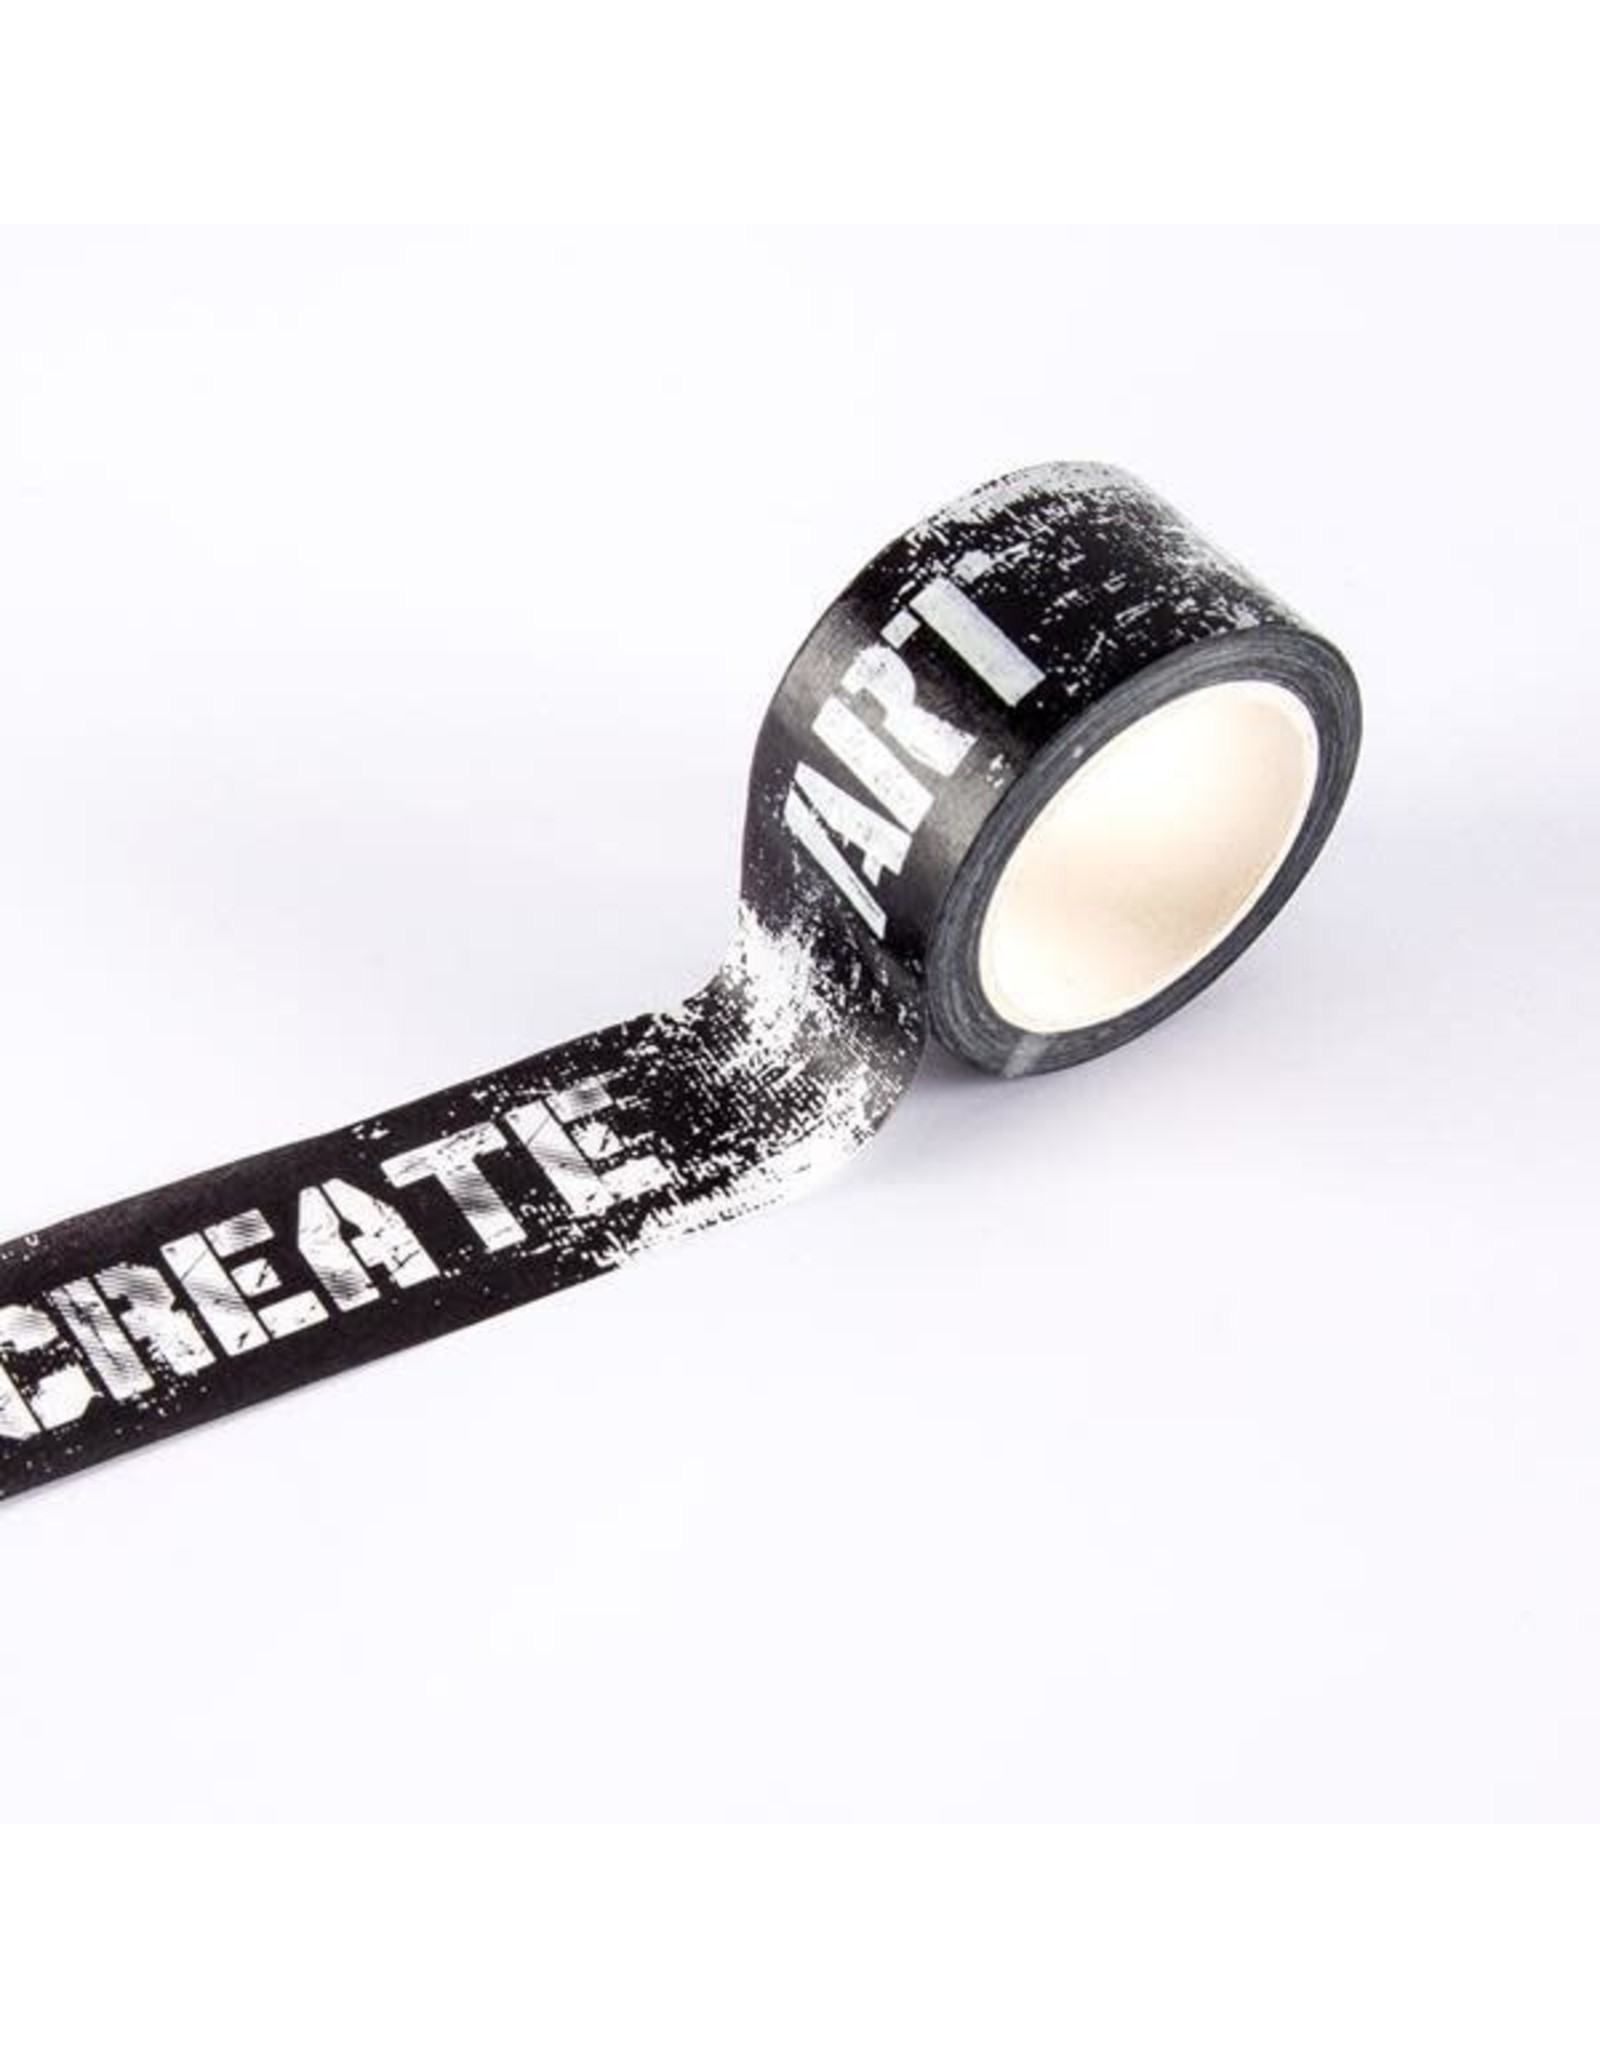 Aall& Create Aall & Create Washitape #5